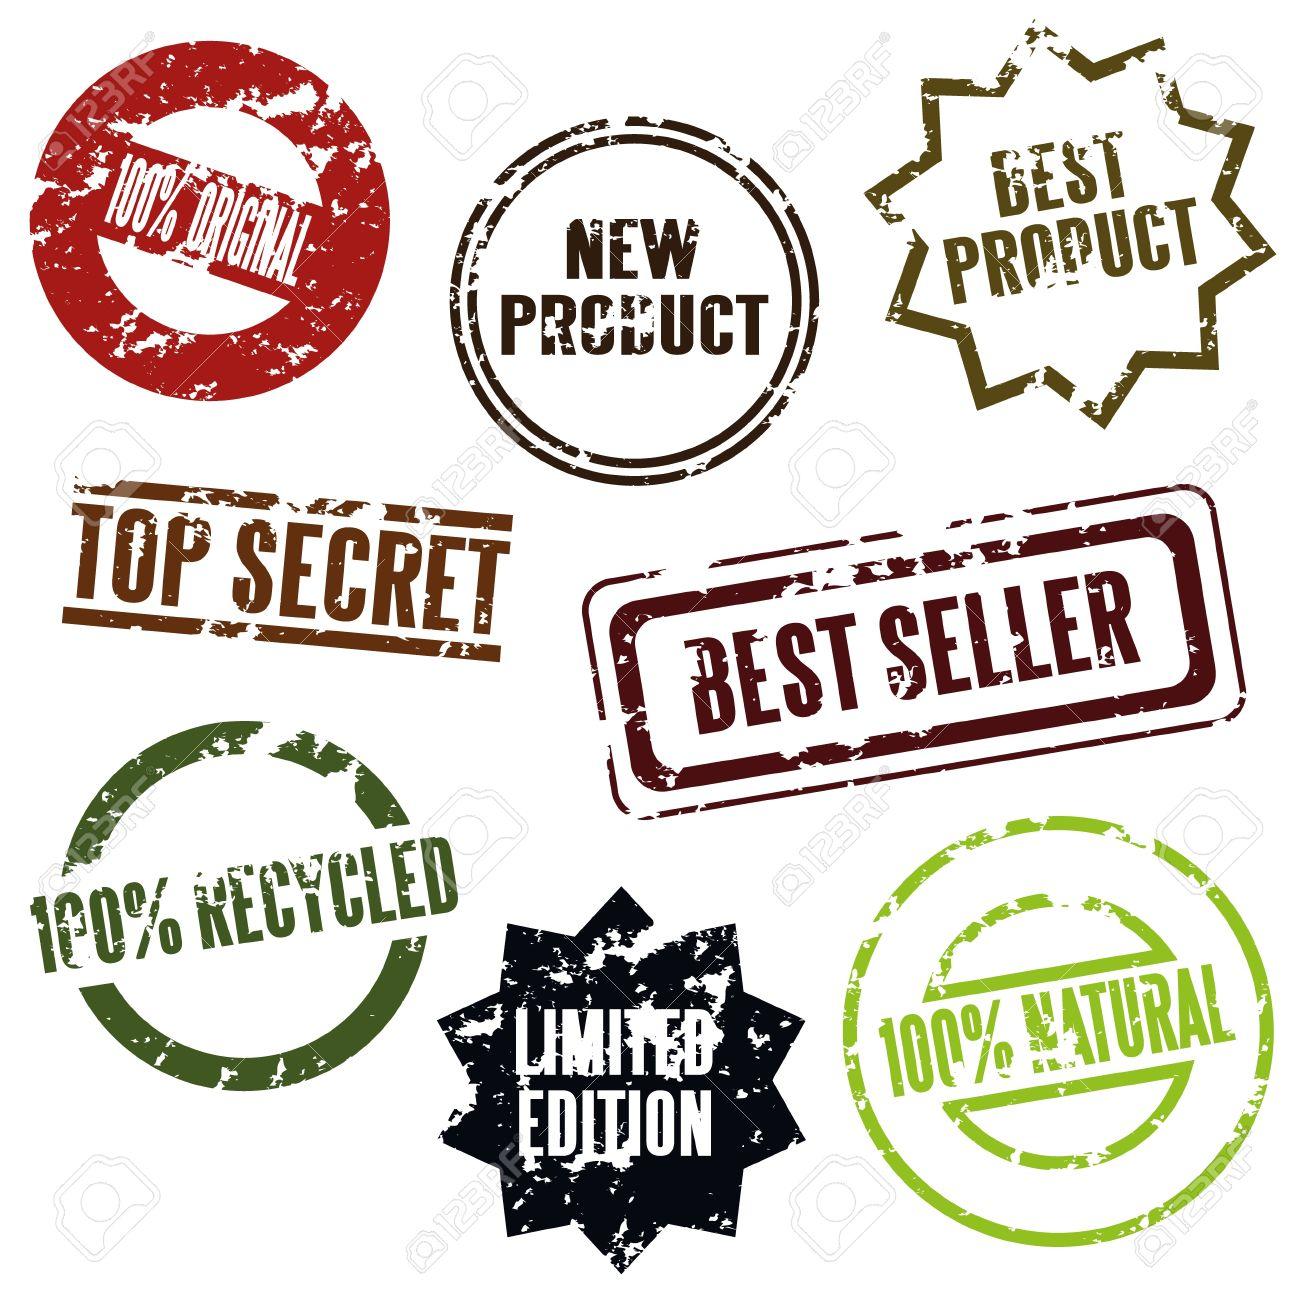 100% original, new product, top secret etc. Stock Vector - 10754304